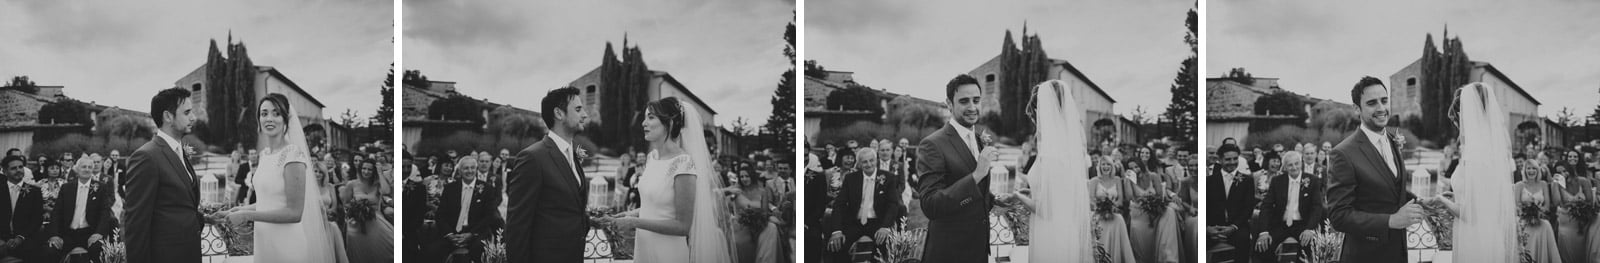 062-wedding-tuscany-san-galgano-federico-pannacci-photographer